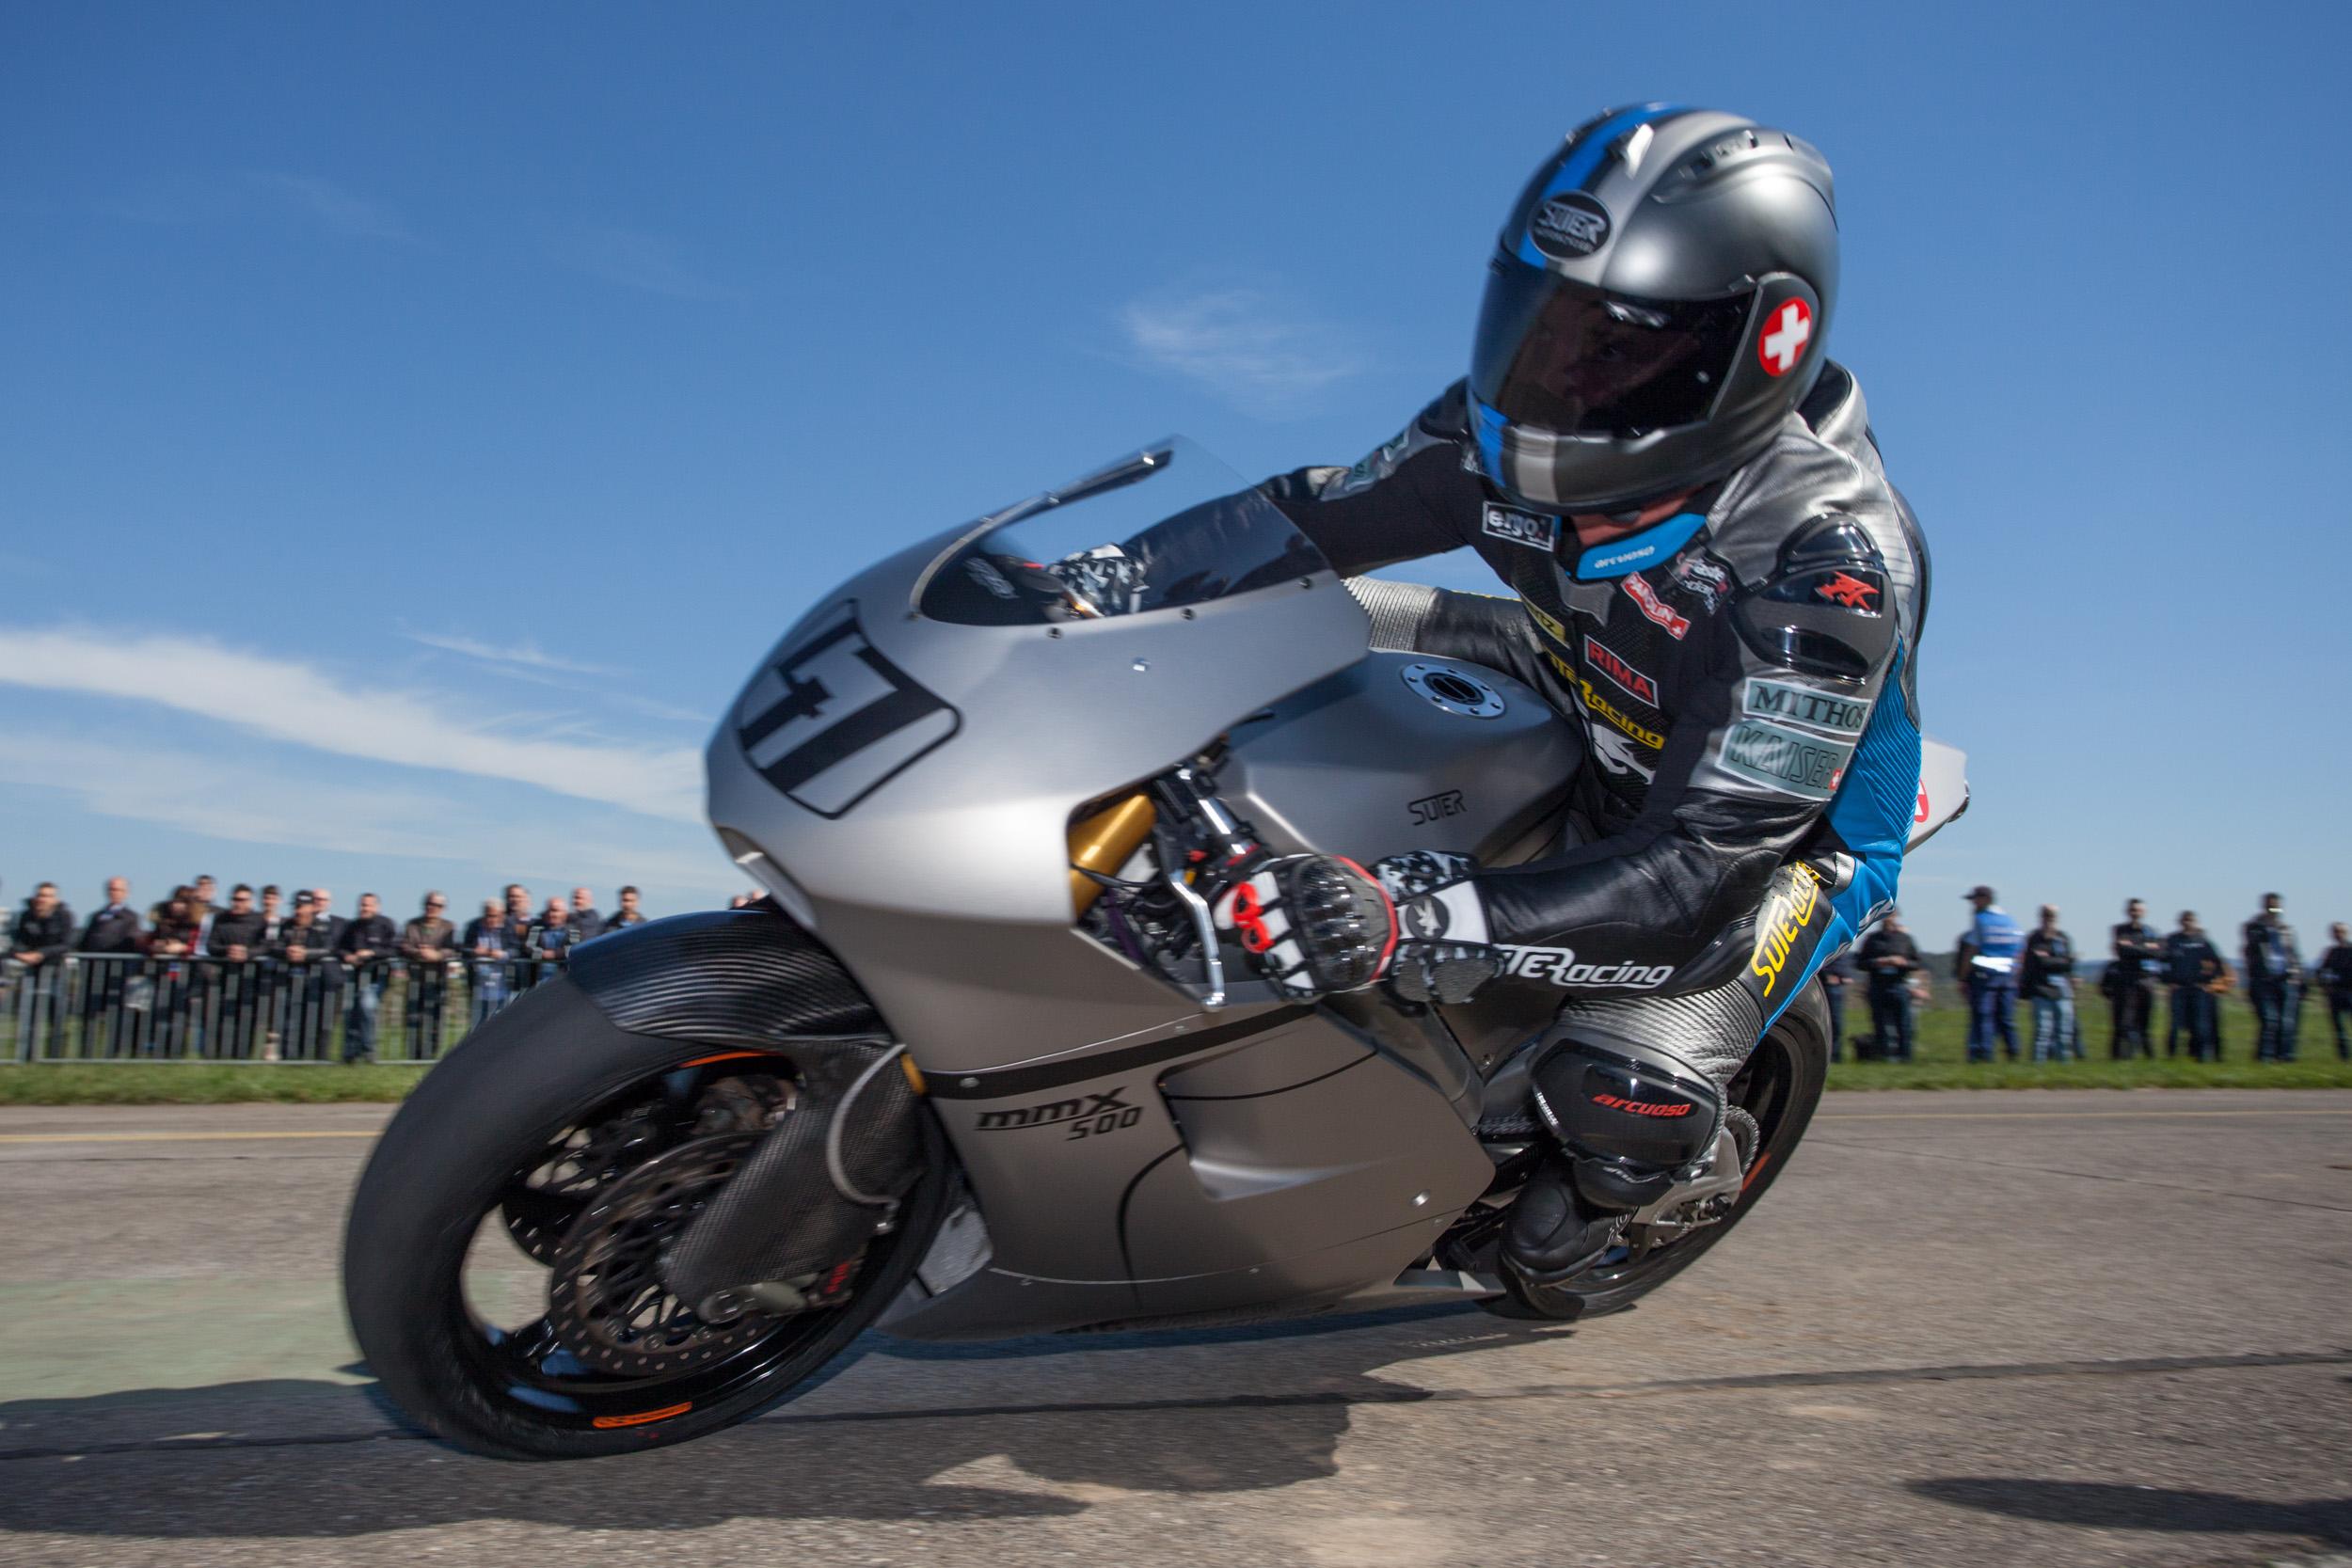 Suter motorcycle